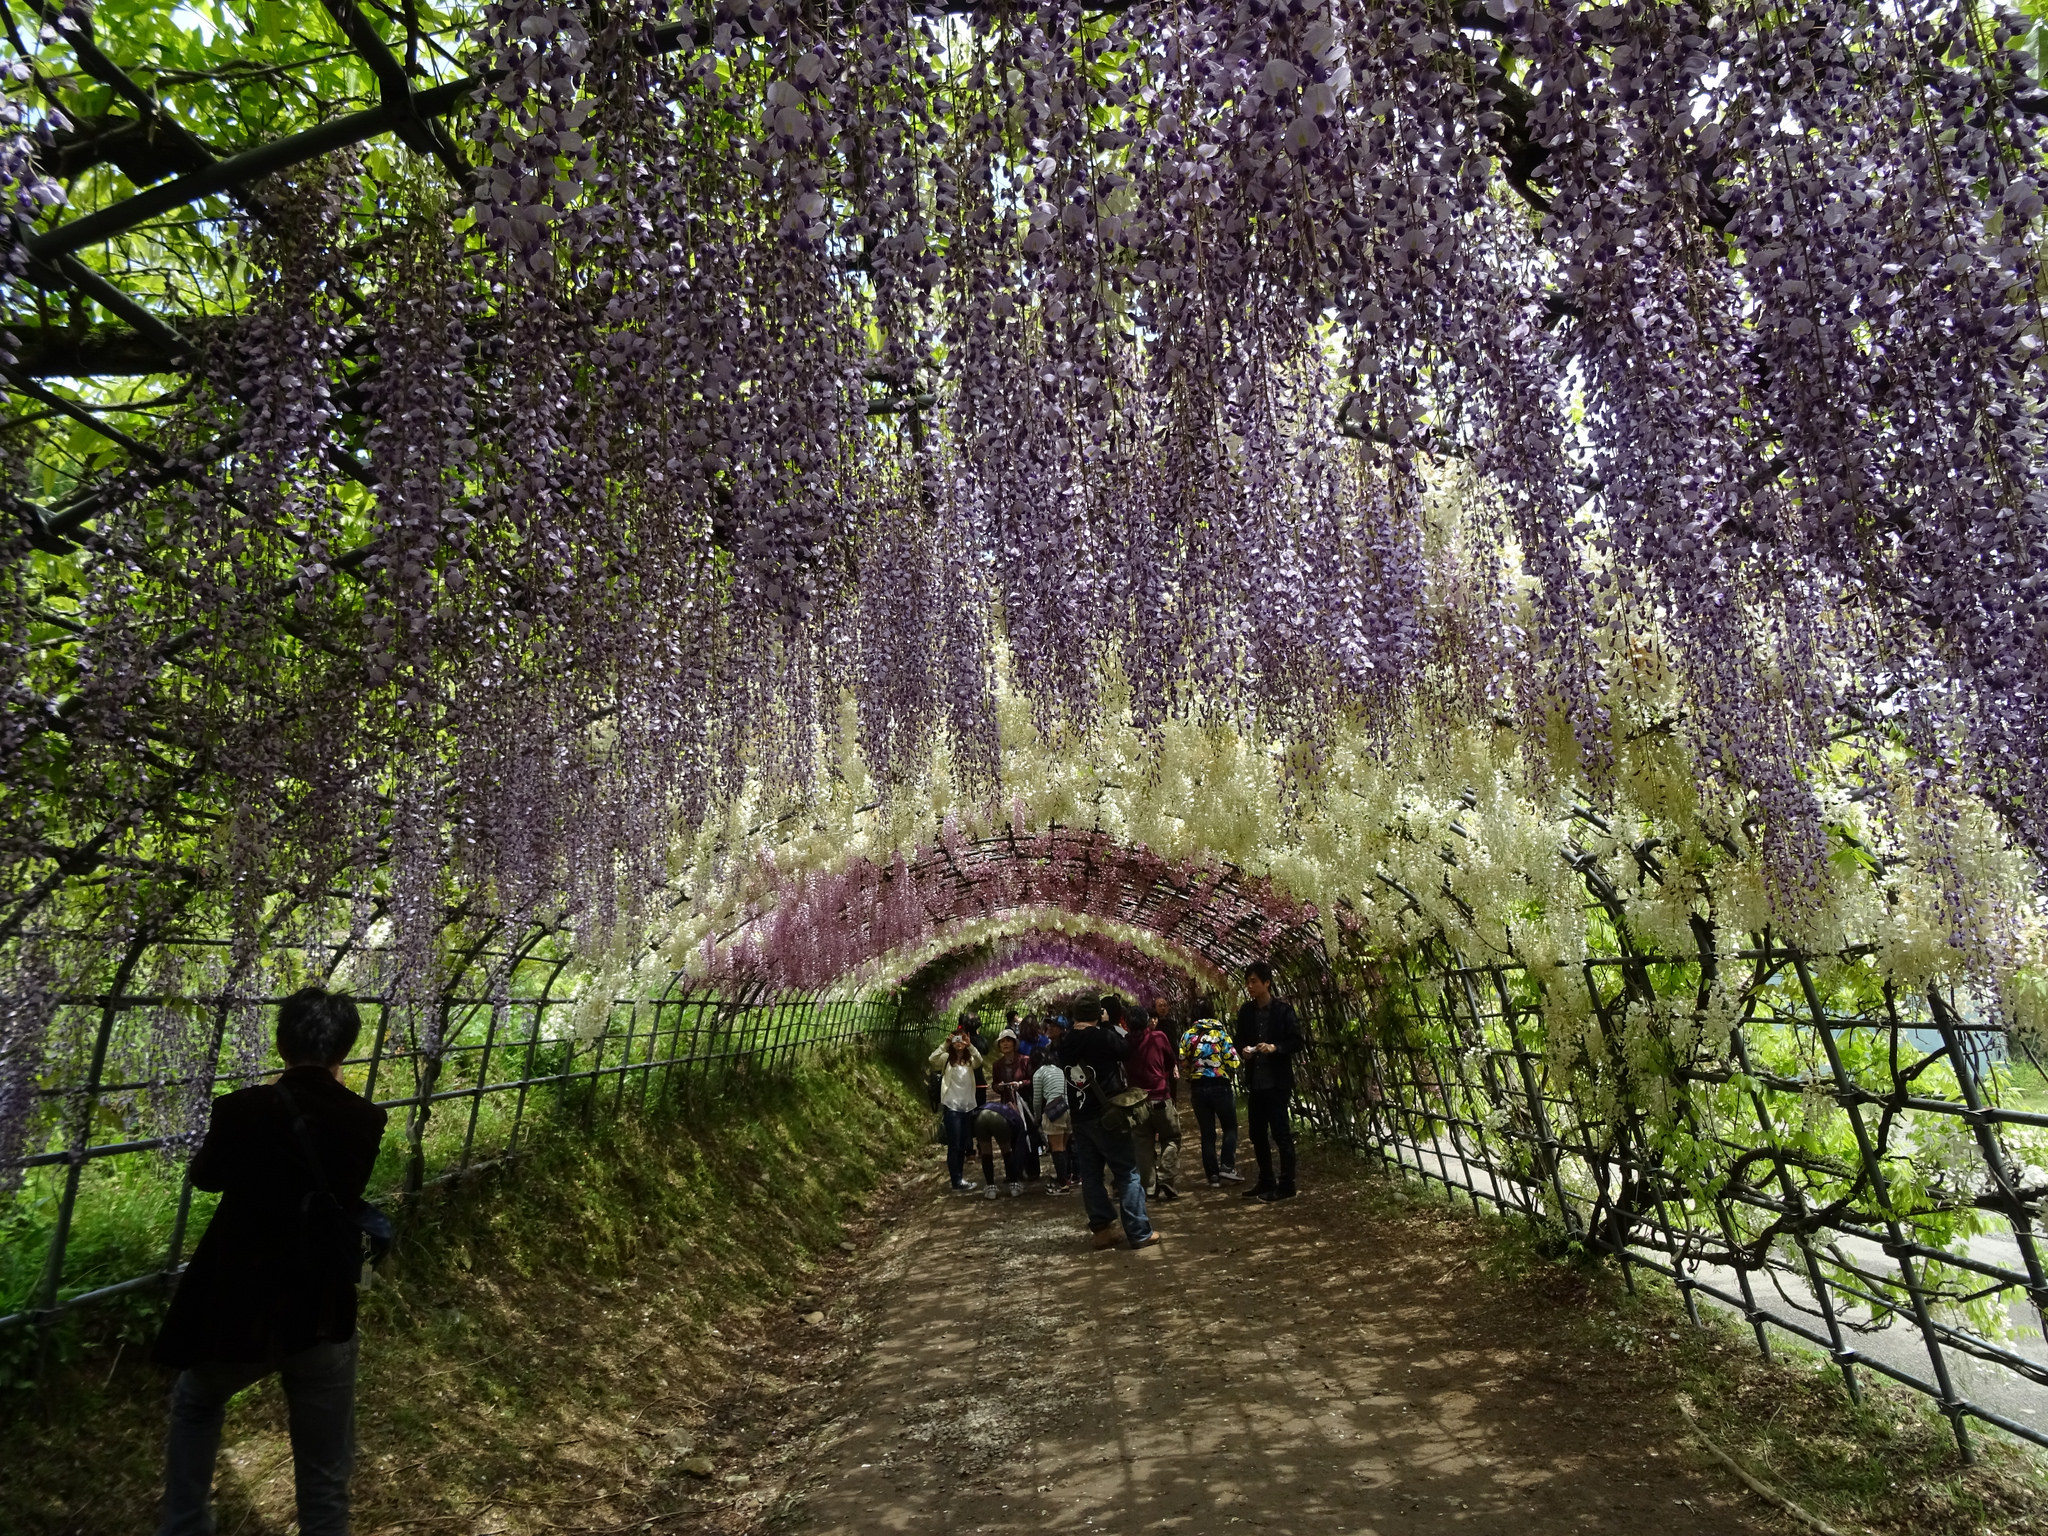 Wisteria Tunnels at Kawachi Fujien Gardens, Japan | © inazakira/Flickr